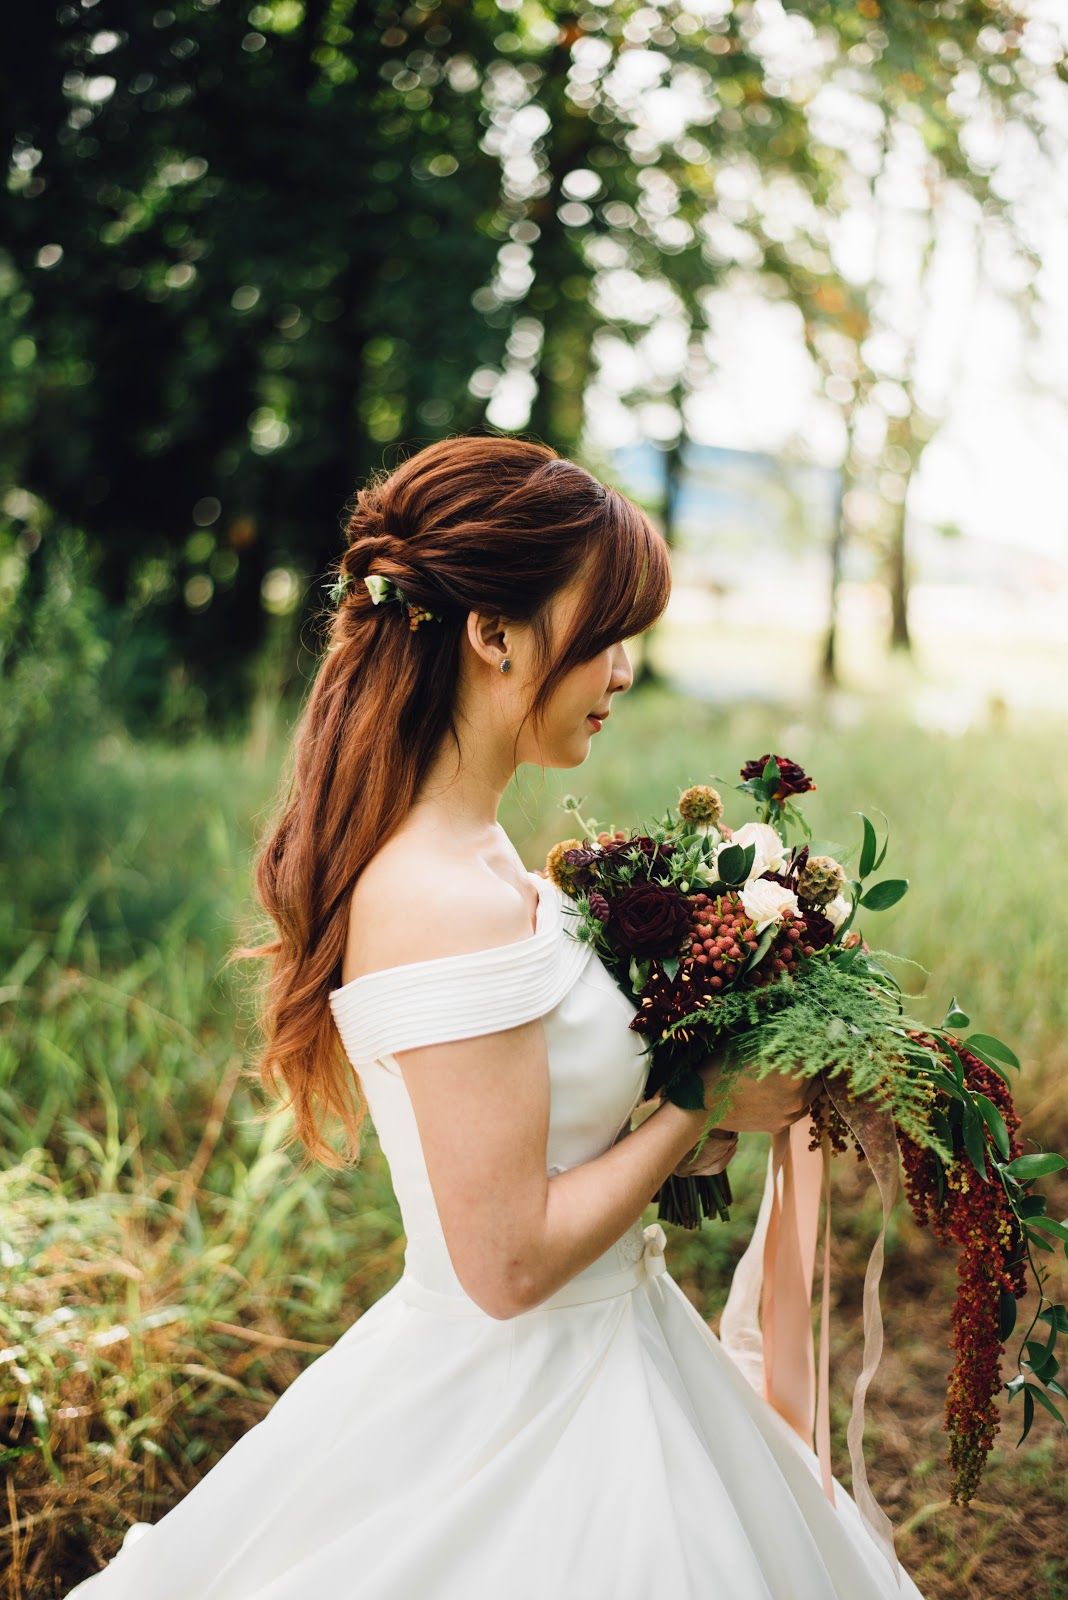 wedding dress photo tips walking down the aisle